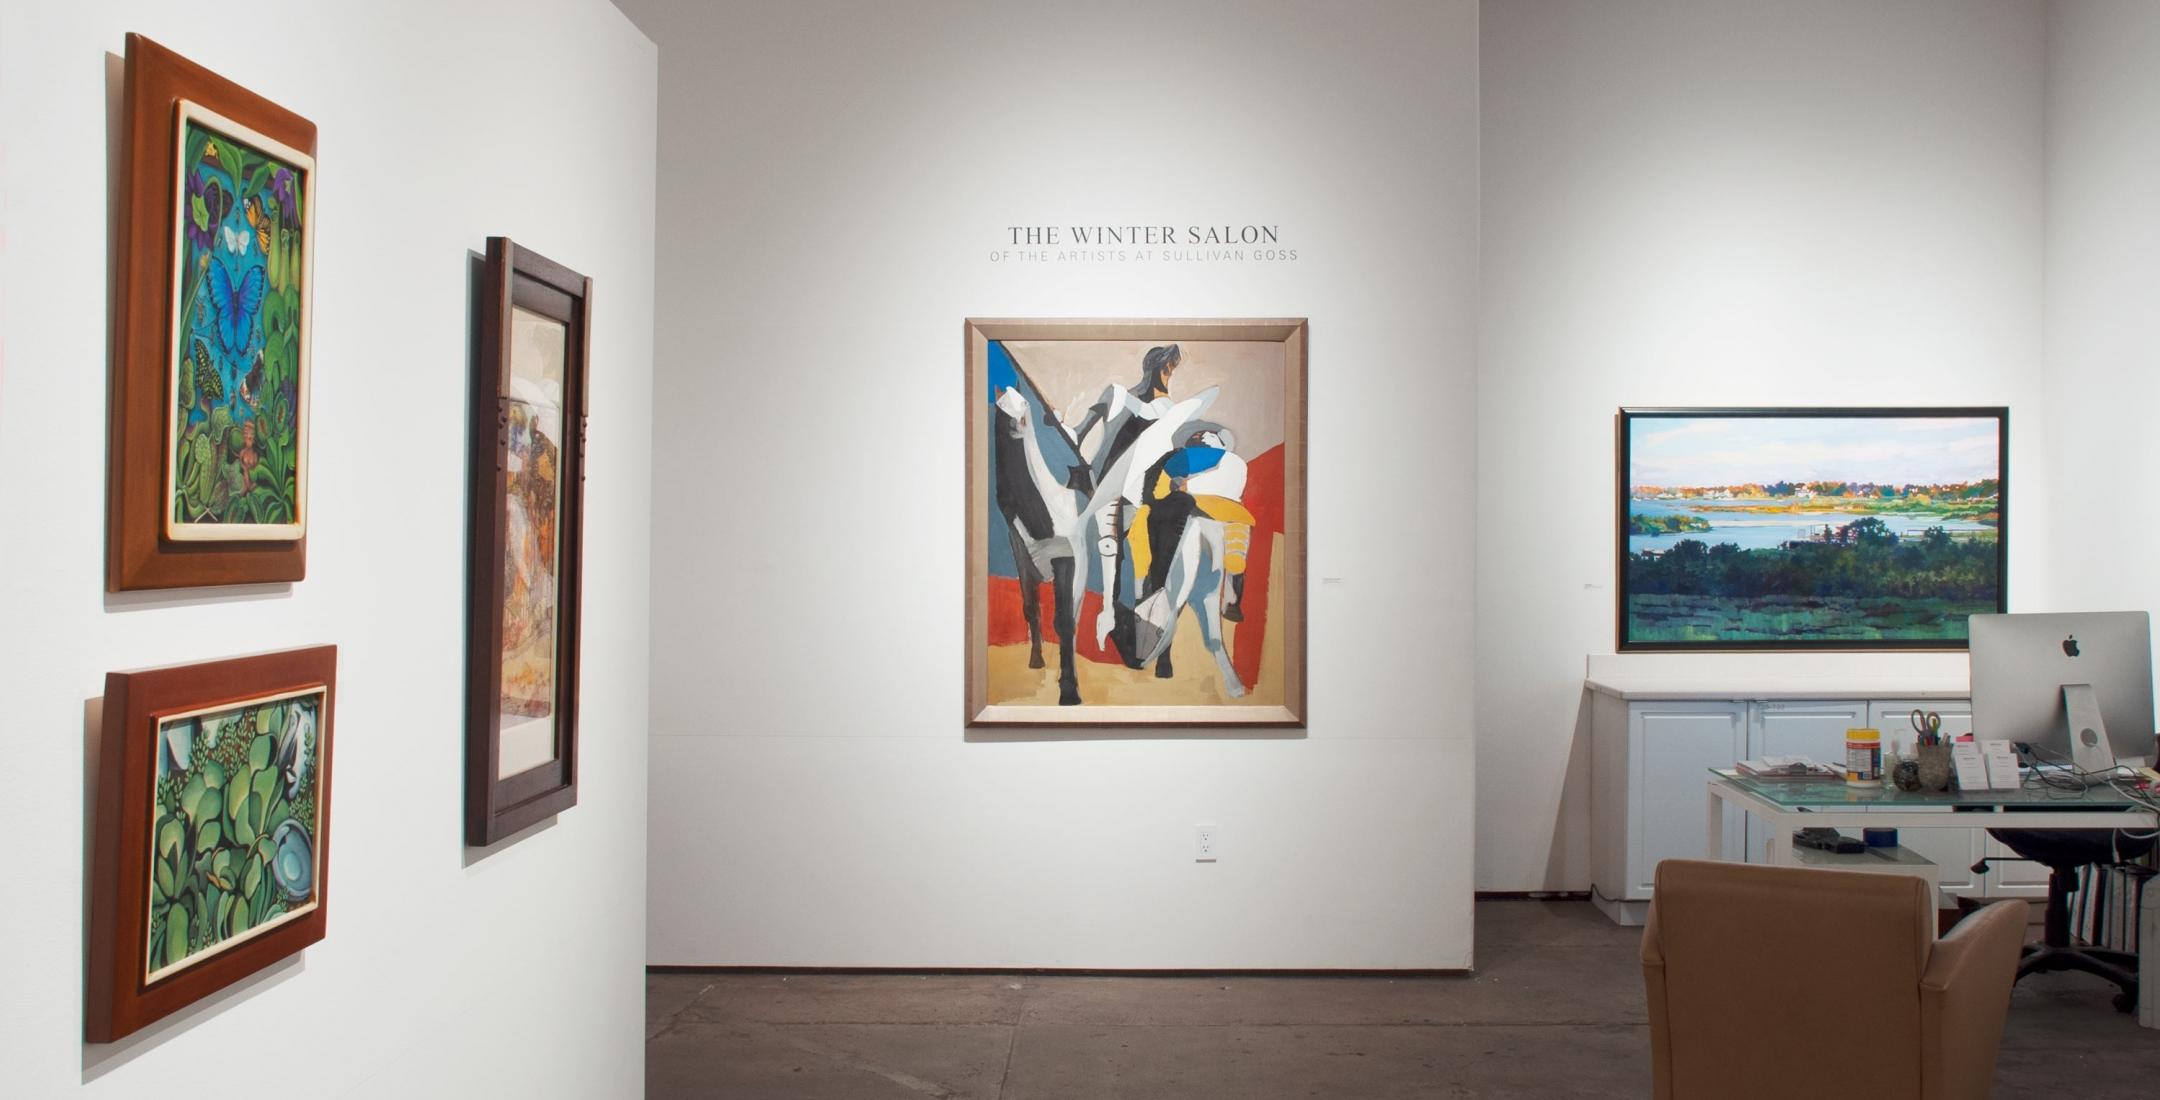 The Winter Salon, 2020